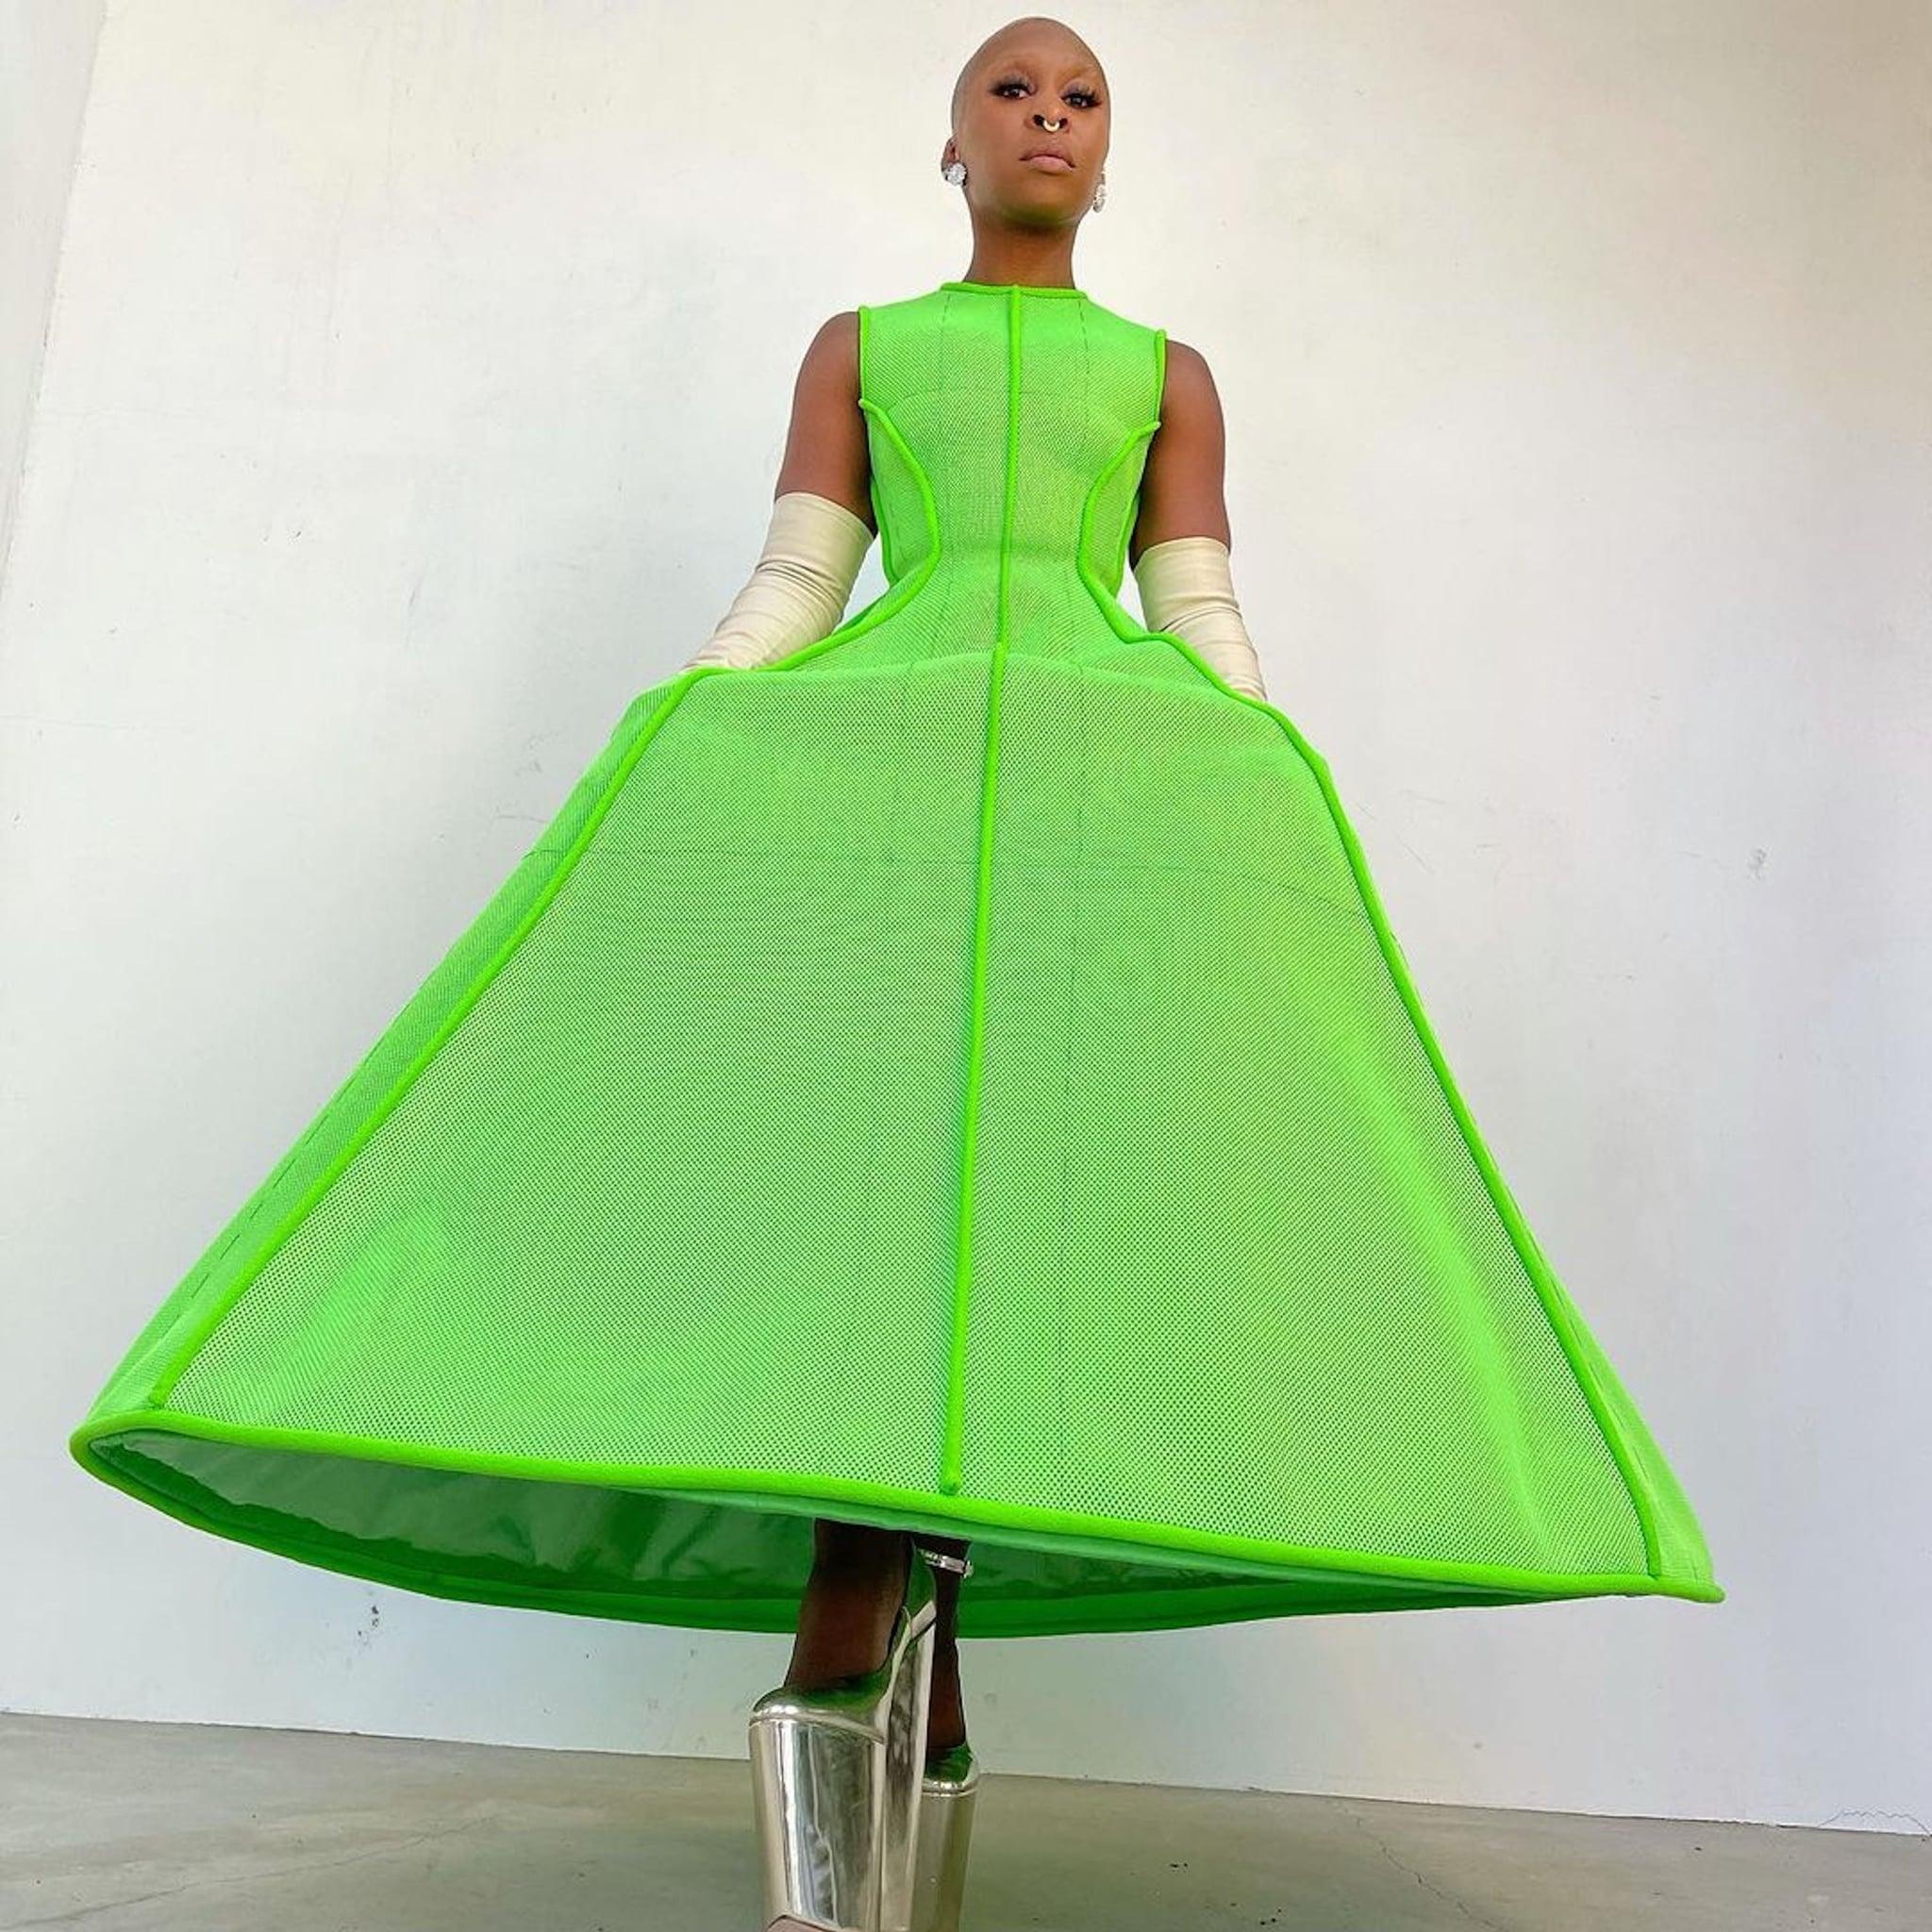 Cynthia Erivo's Green Valentino Dress at the Golden Globes | POPSUGAR  Fashion